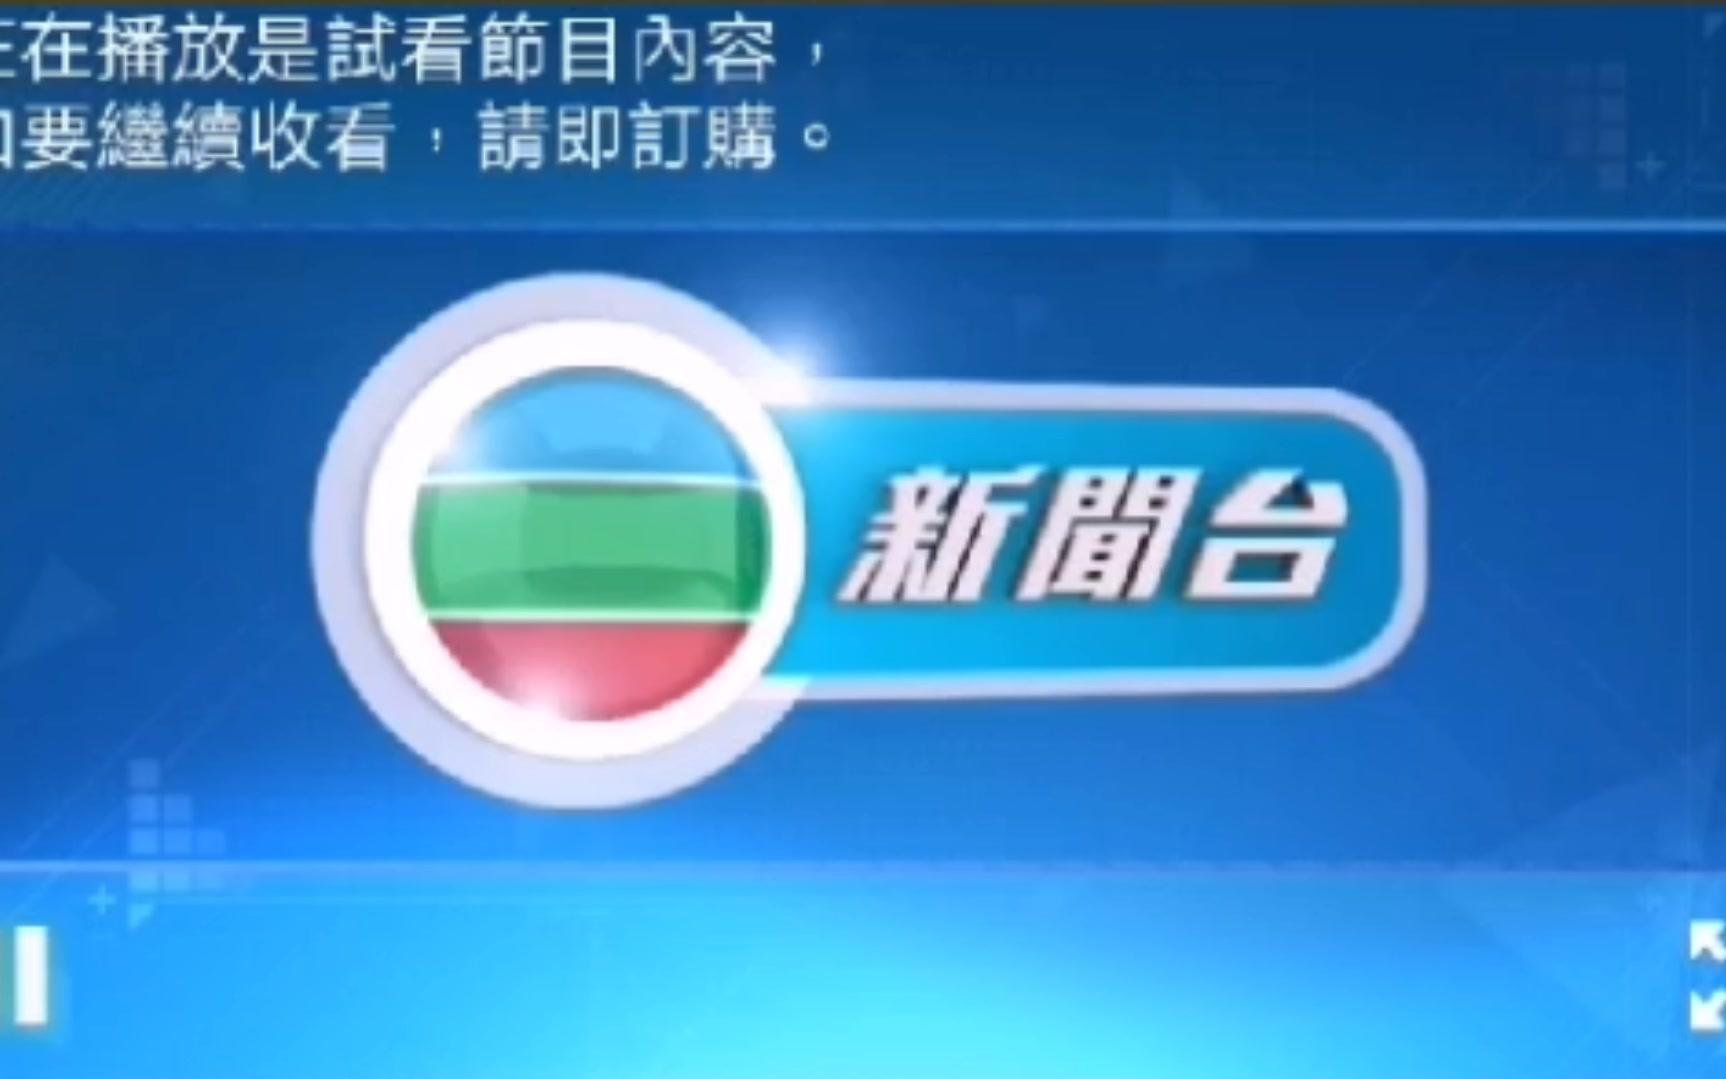 TVB新聞臺Idnet完整版2_嗶哩嗶哩 (゜-゜)つロ 干杯~-bilibili